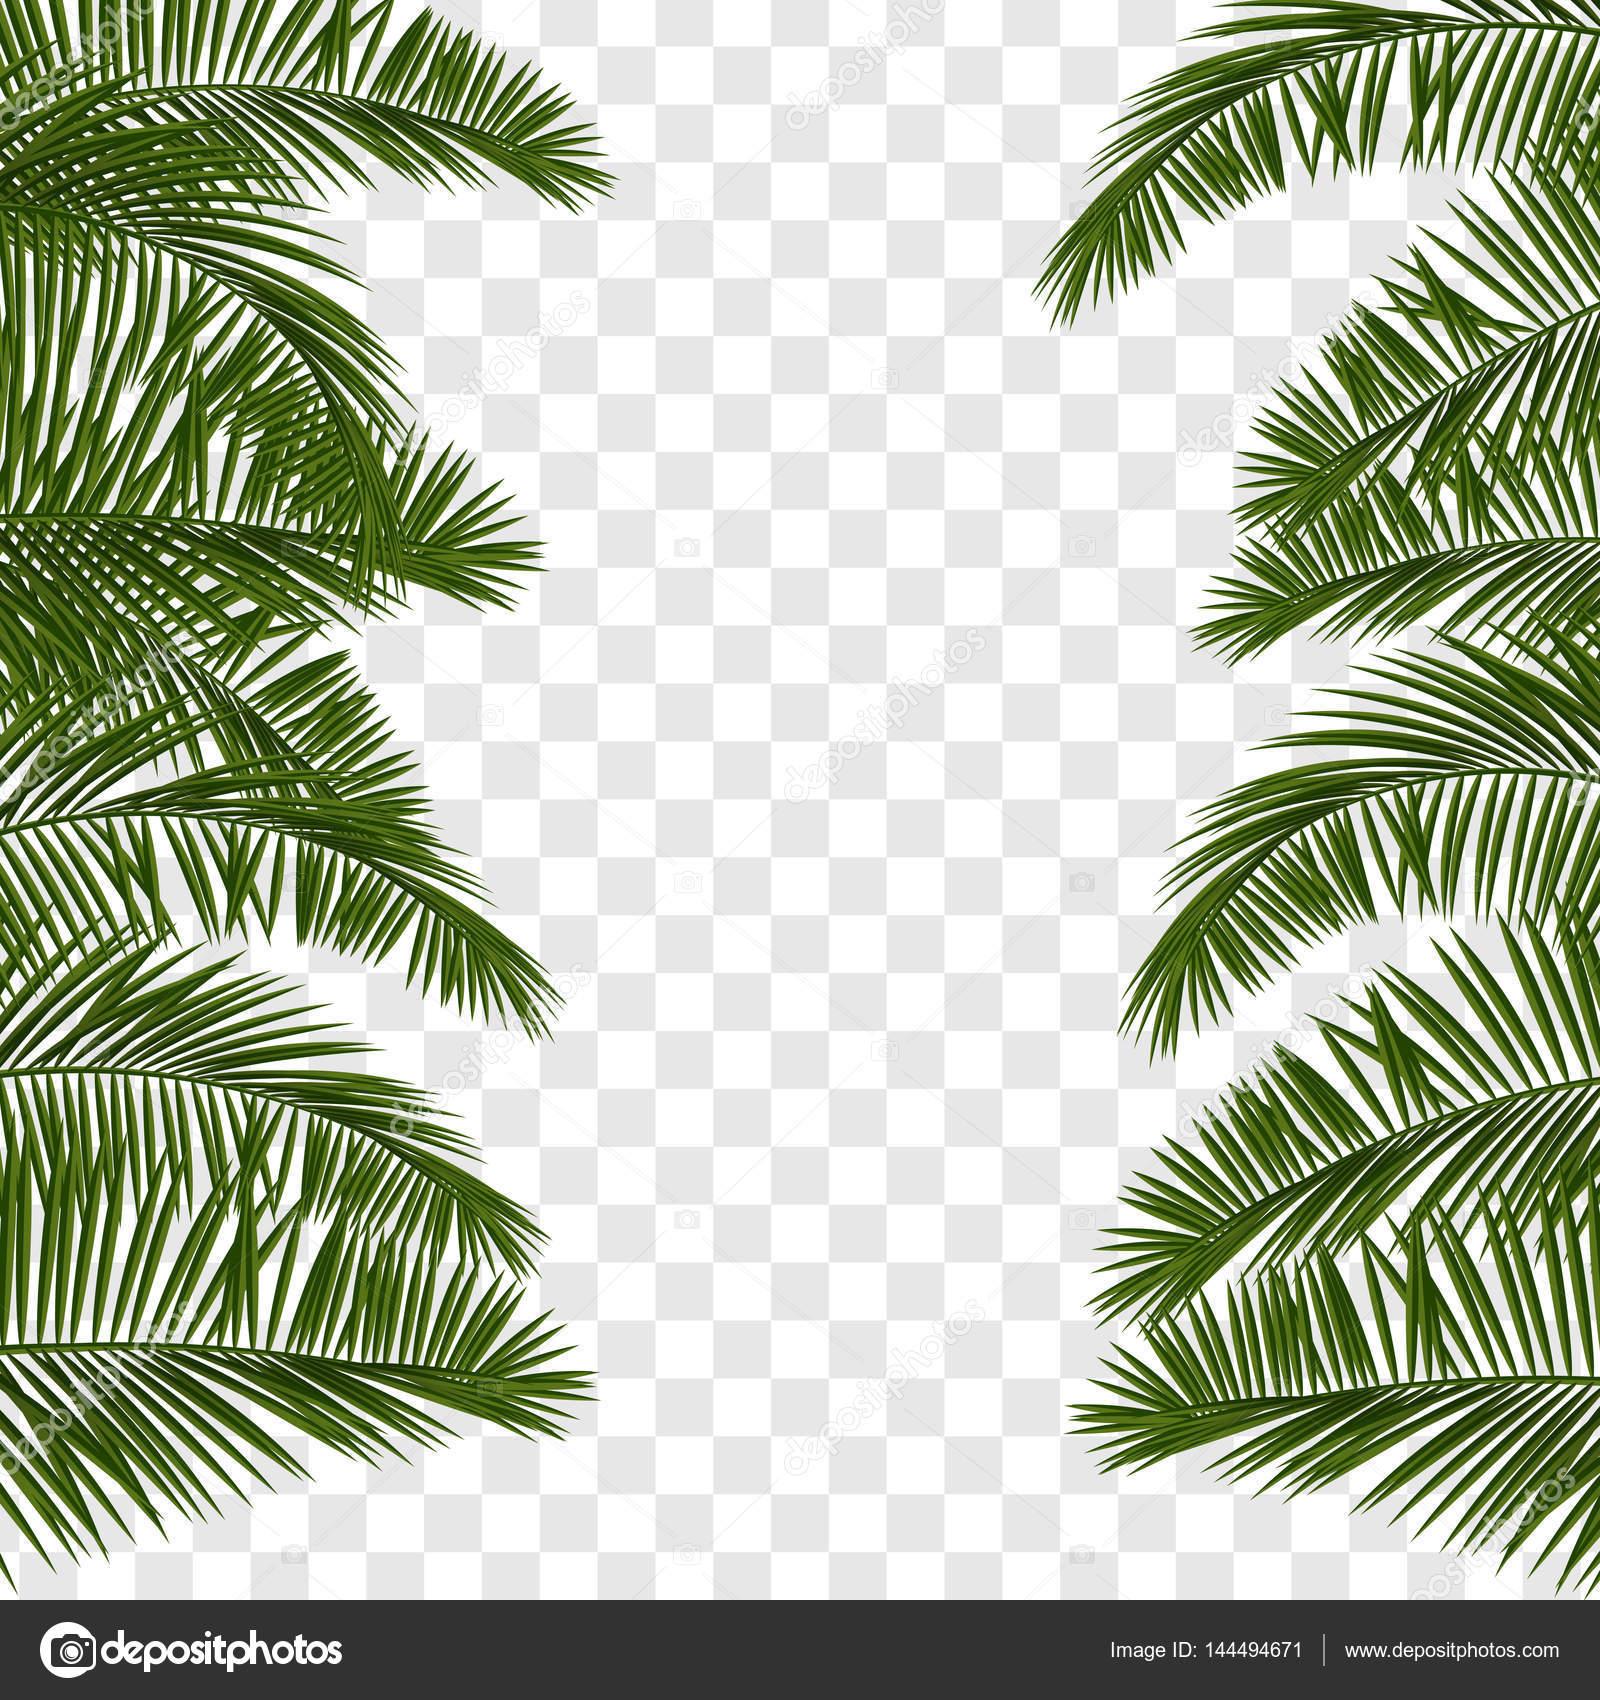 summer green palm leaf transparent stock vector helen tosh